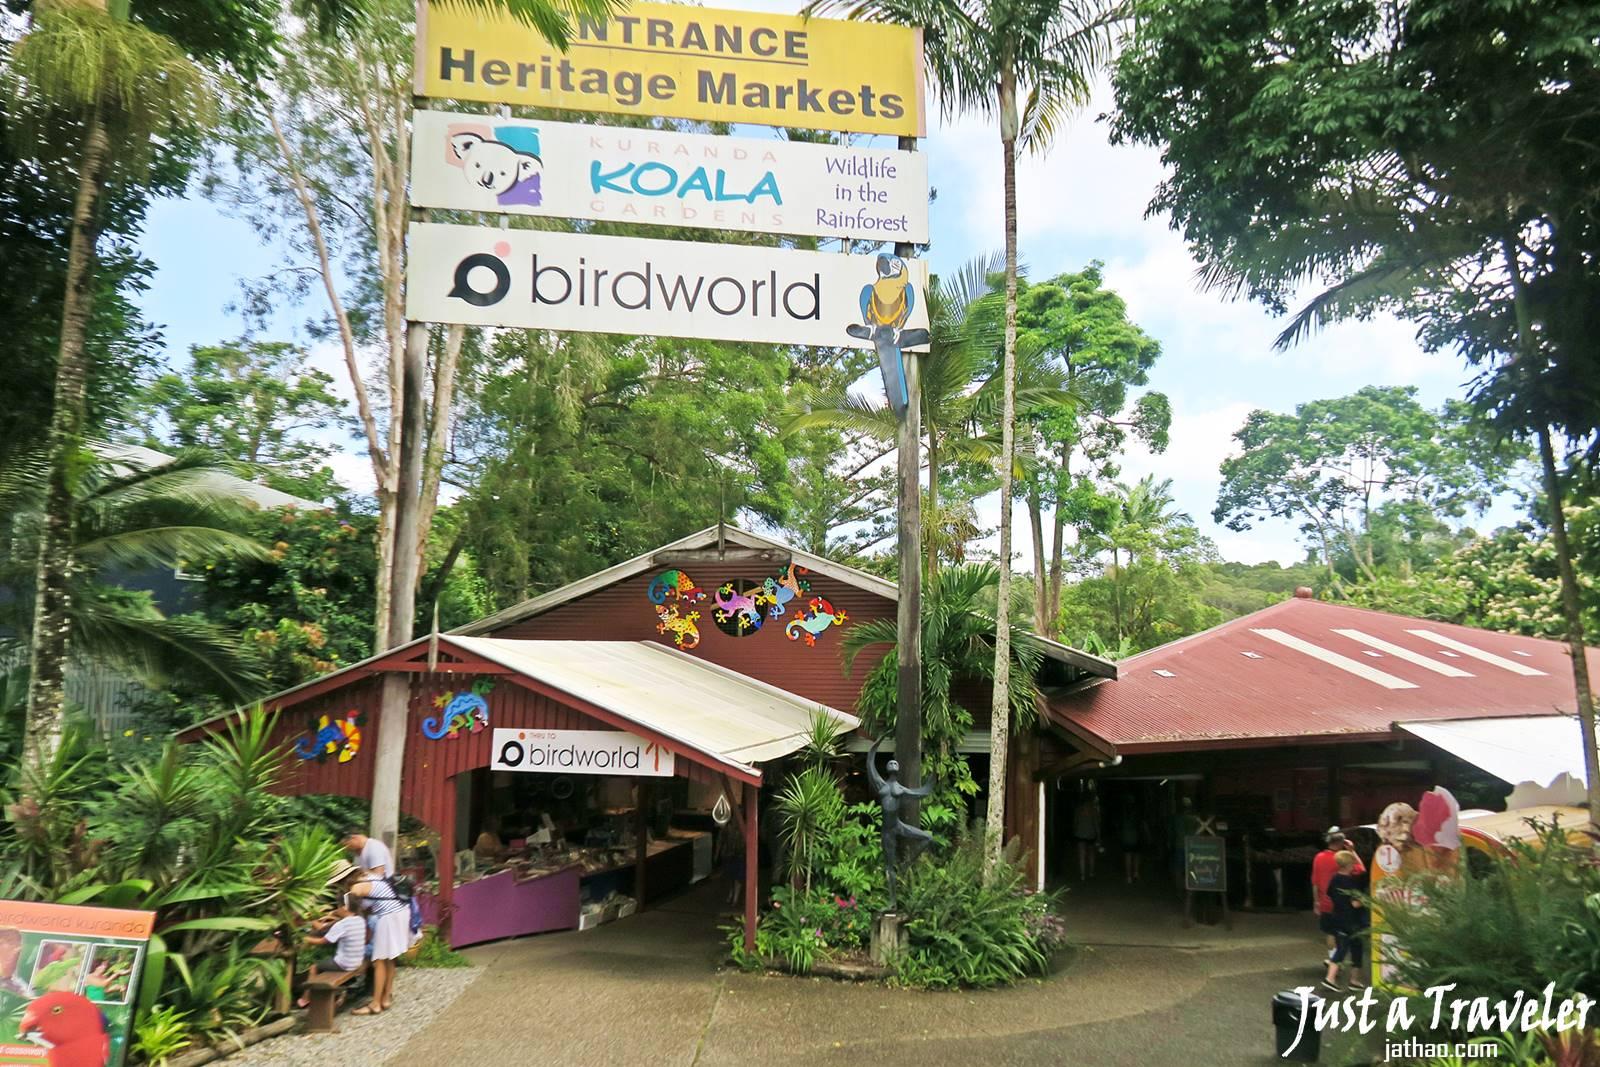 凱恩斯-庫蘭達-景點-鳥世界-無尾熊花園-自由行-旅遊-澳洲-Cairns-Kuranda-Bridworld-Koala-Gardens-Travel-Tourist-Attraction-Australia